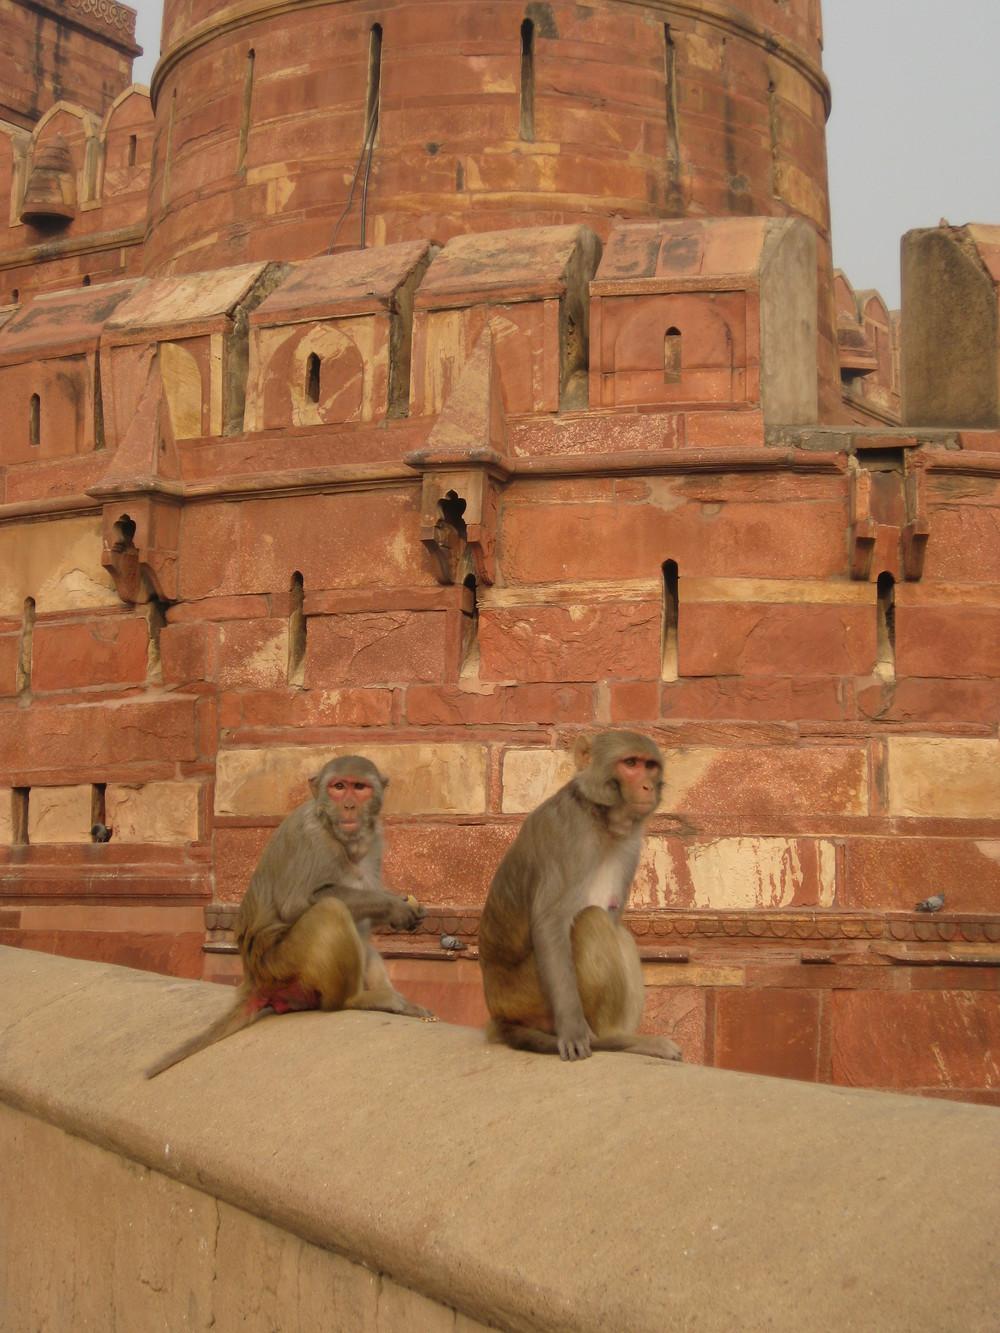 Monkeys surveying the scene